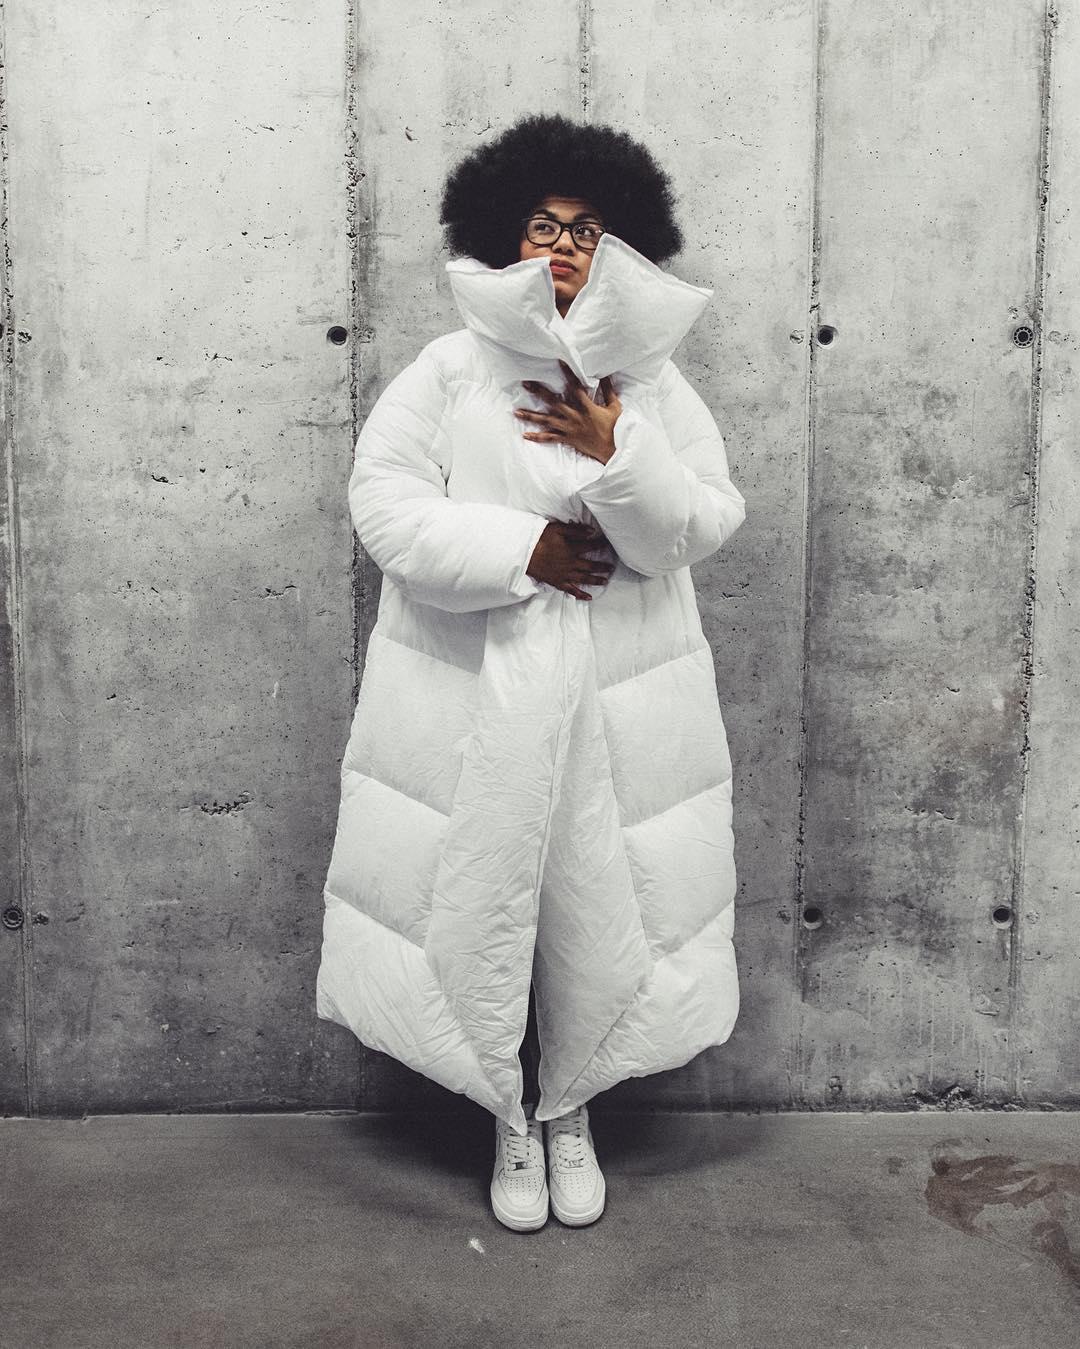 zhenskie-kurtki-zima-2018-6 Модные женские куртки на сезоны осень, зима, весна 2018 - 2019! Тенденции, новинки, 115 фото%obz